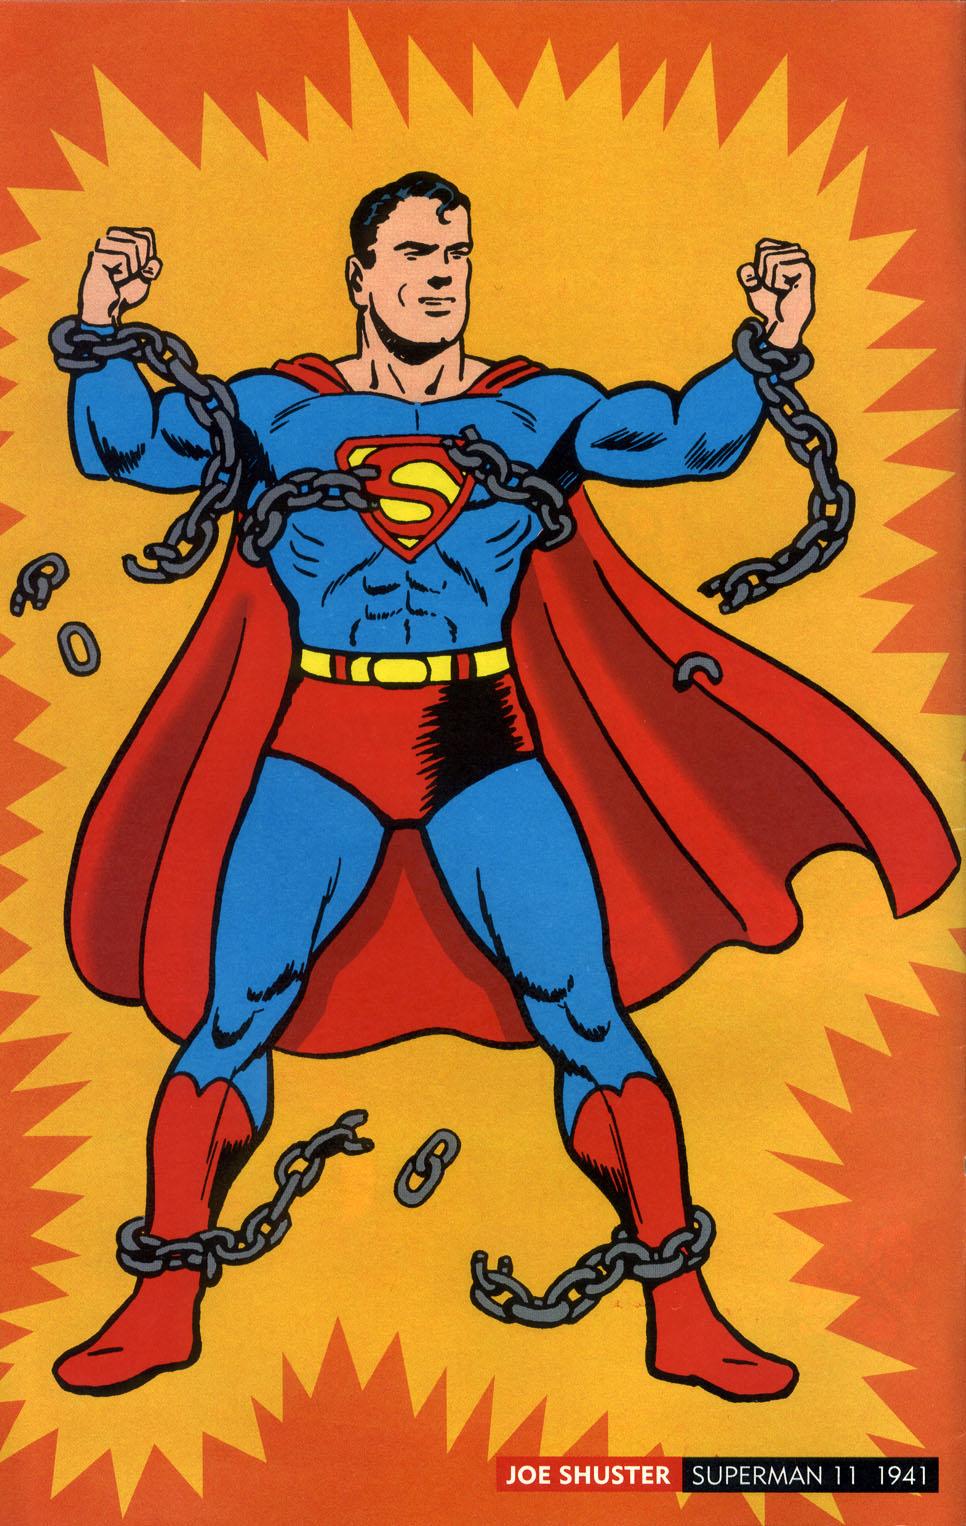 https://i2.wp.com/comicartcommunity.com/gallery/data/media/216/superman_gallery_1_-_02_-_joe_shuster.jpg